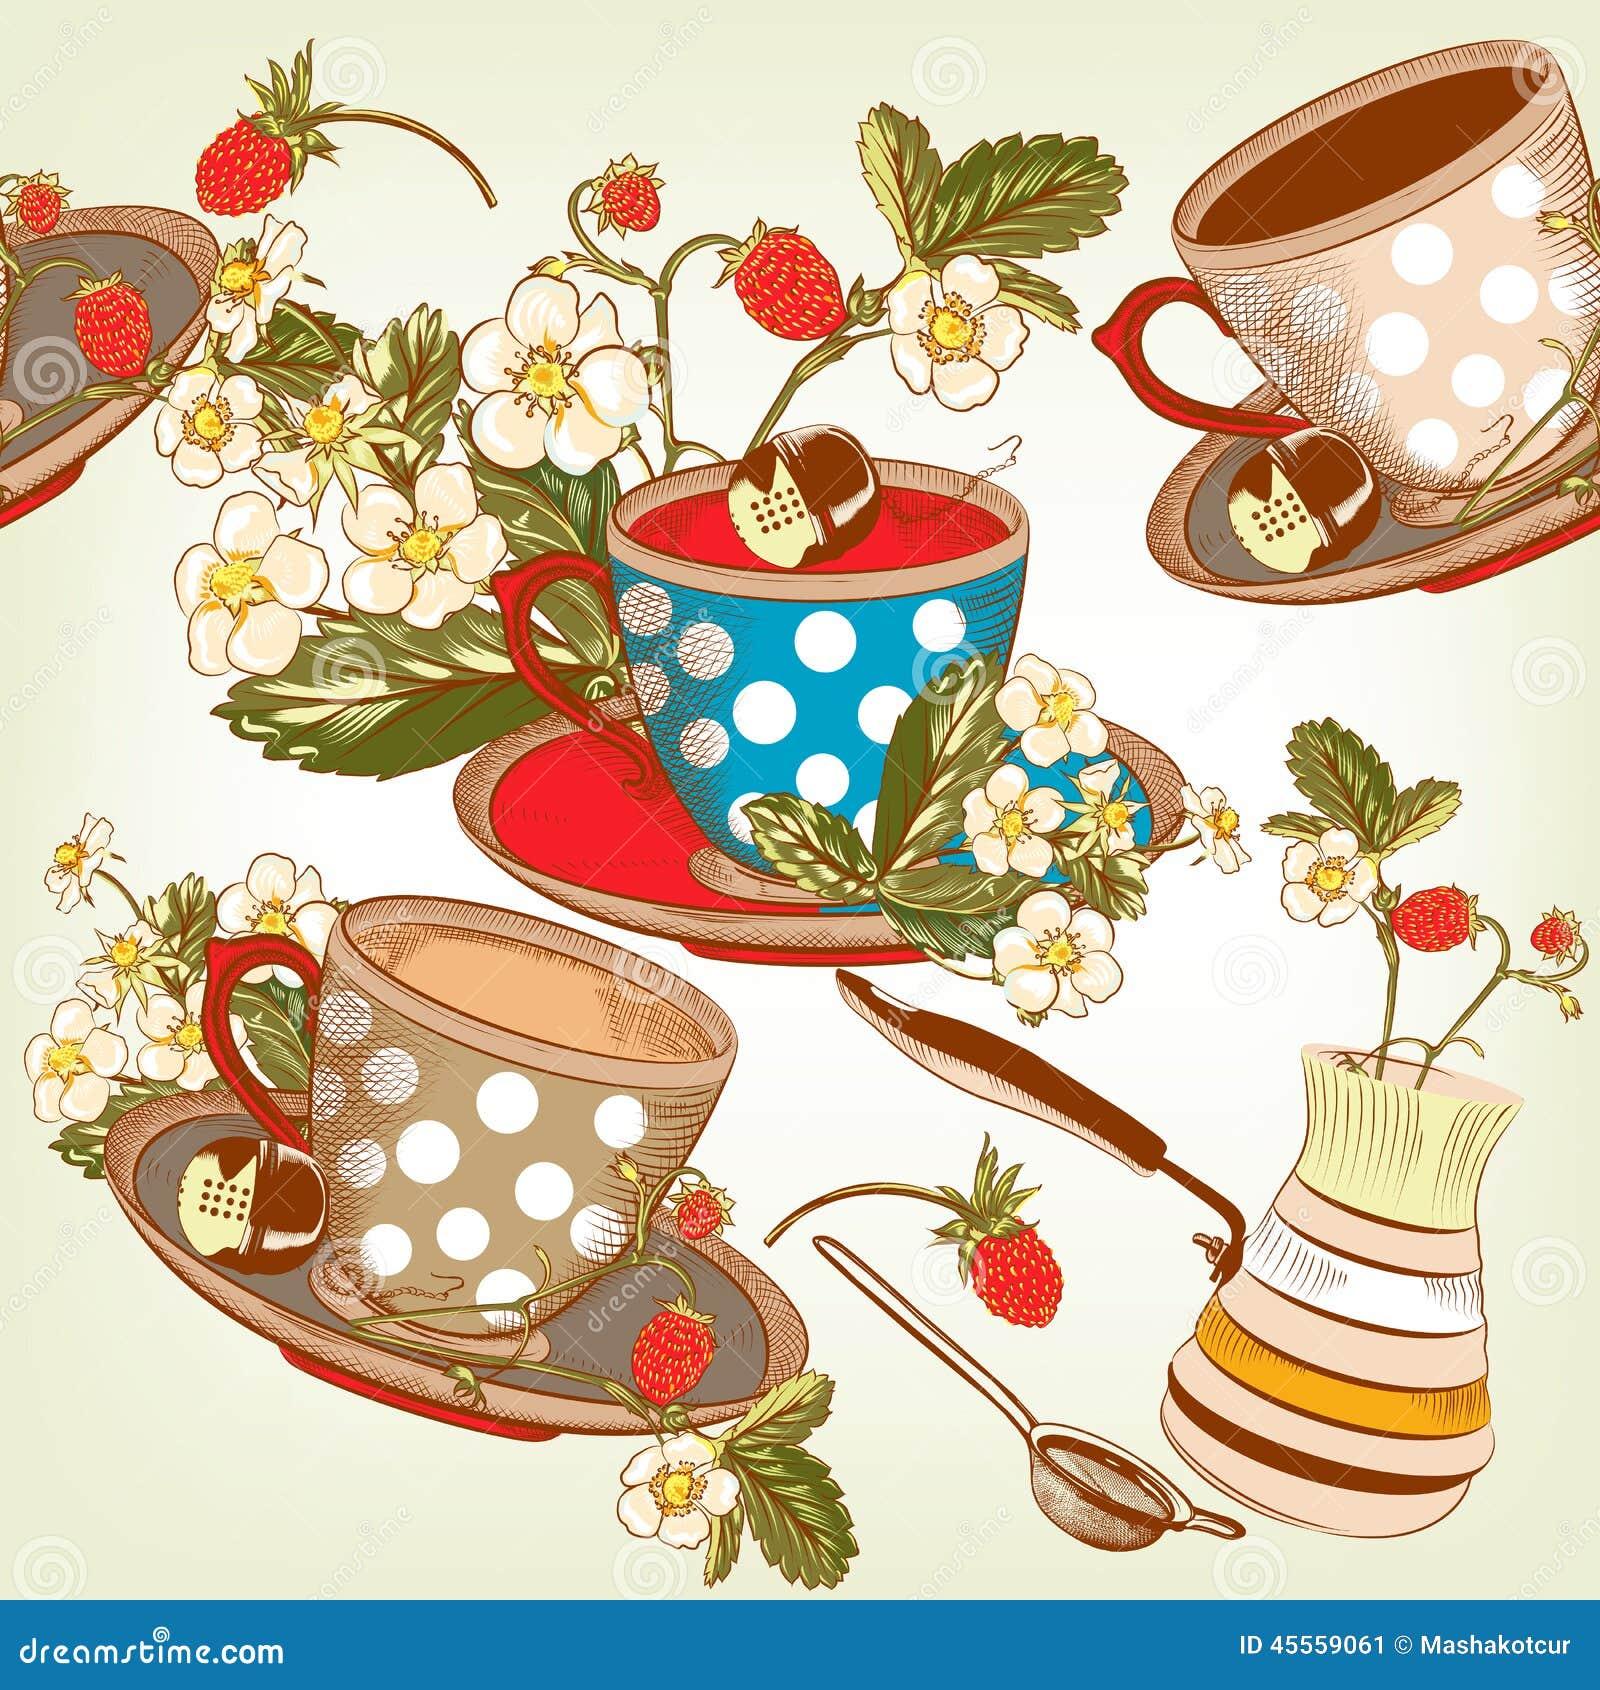 vintage tea cup wallpaper - photo #13